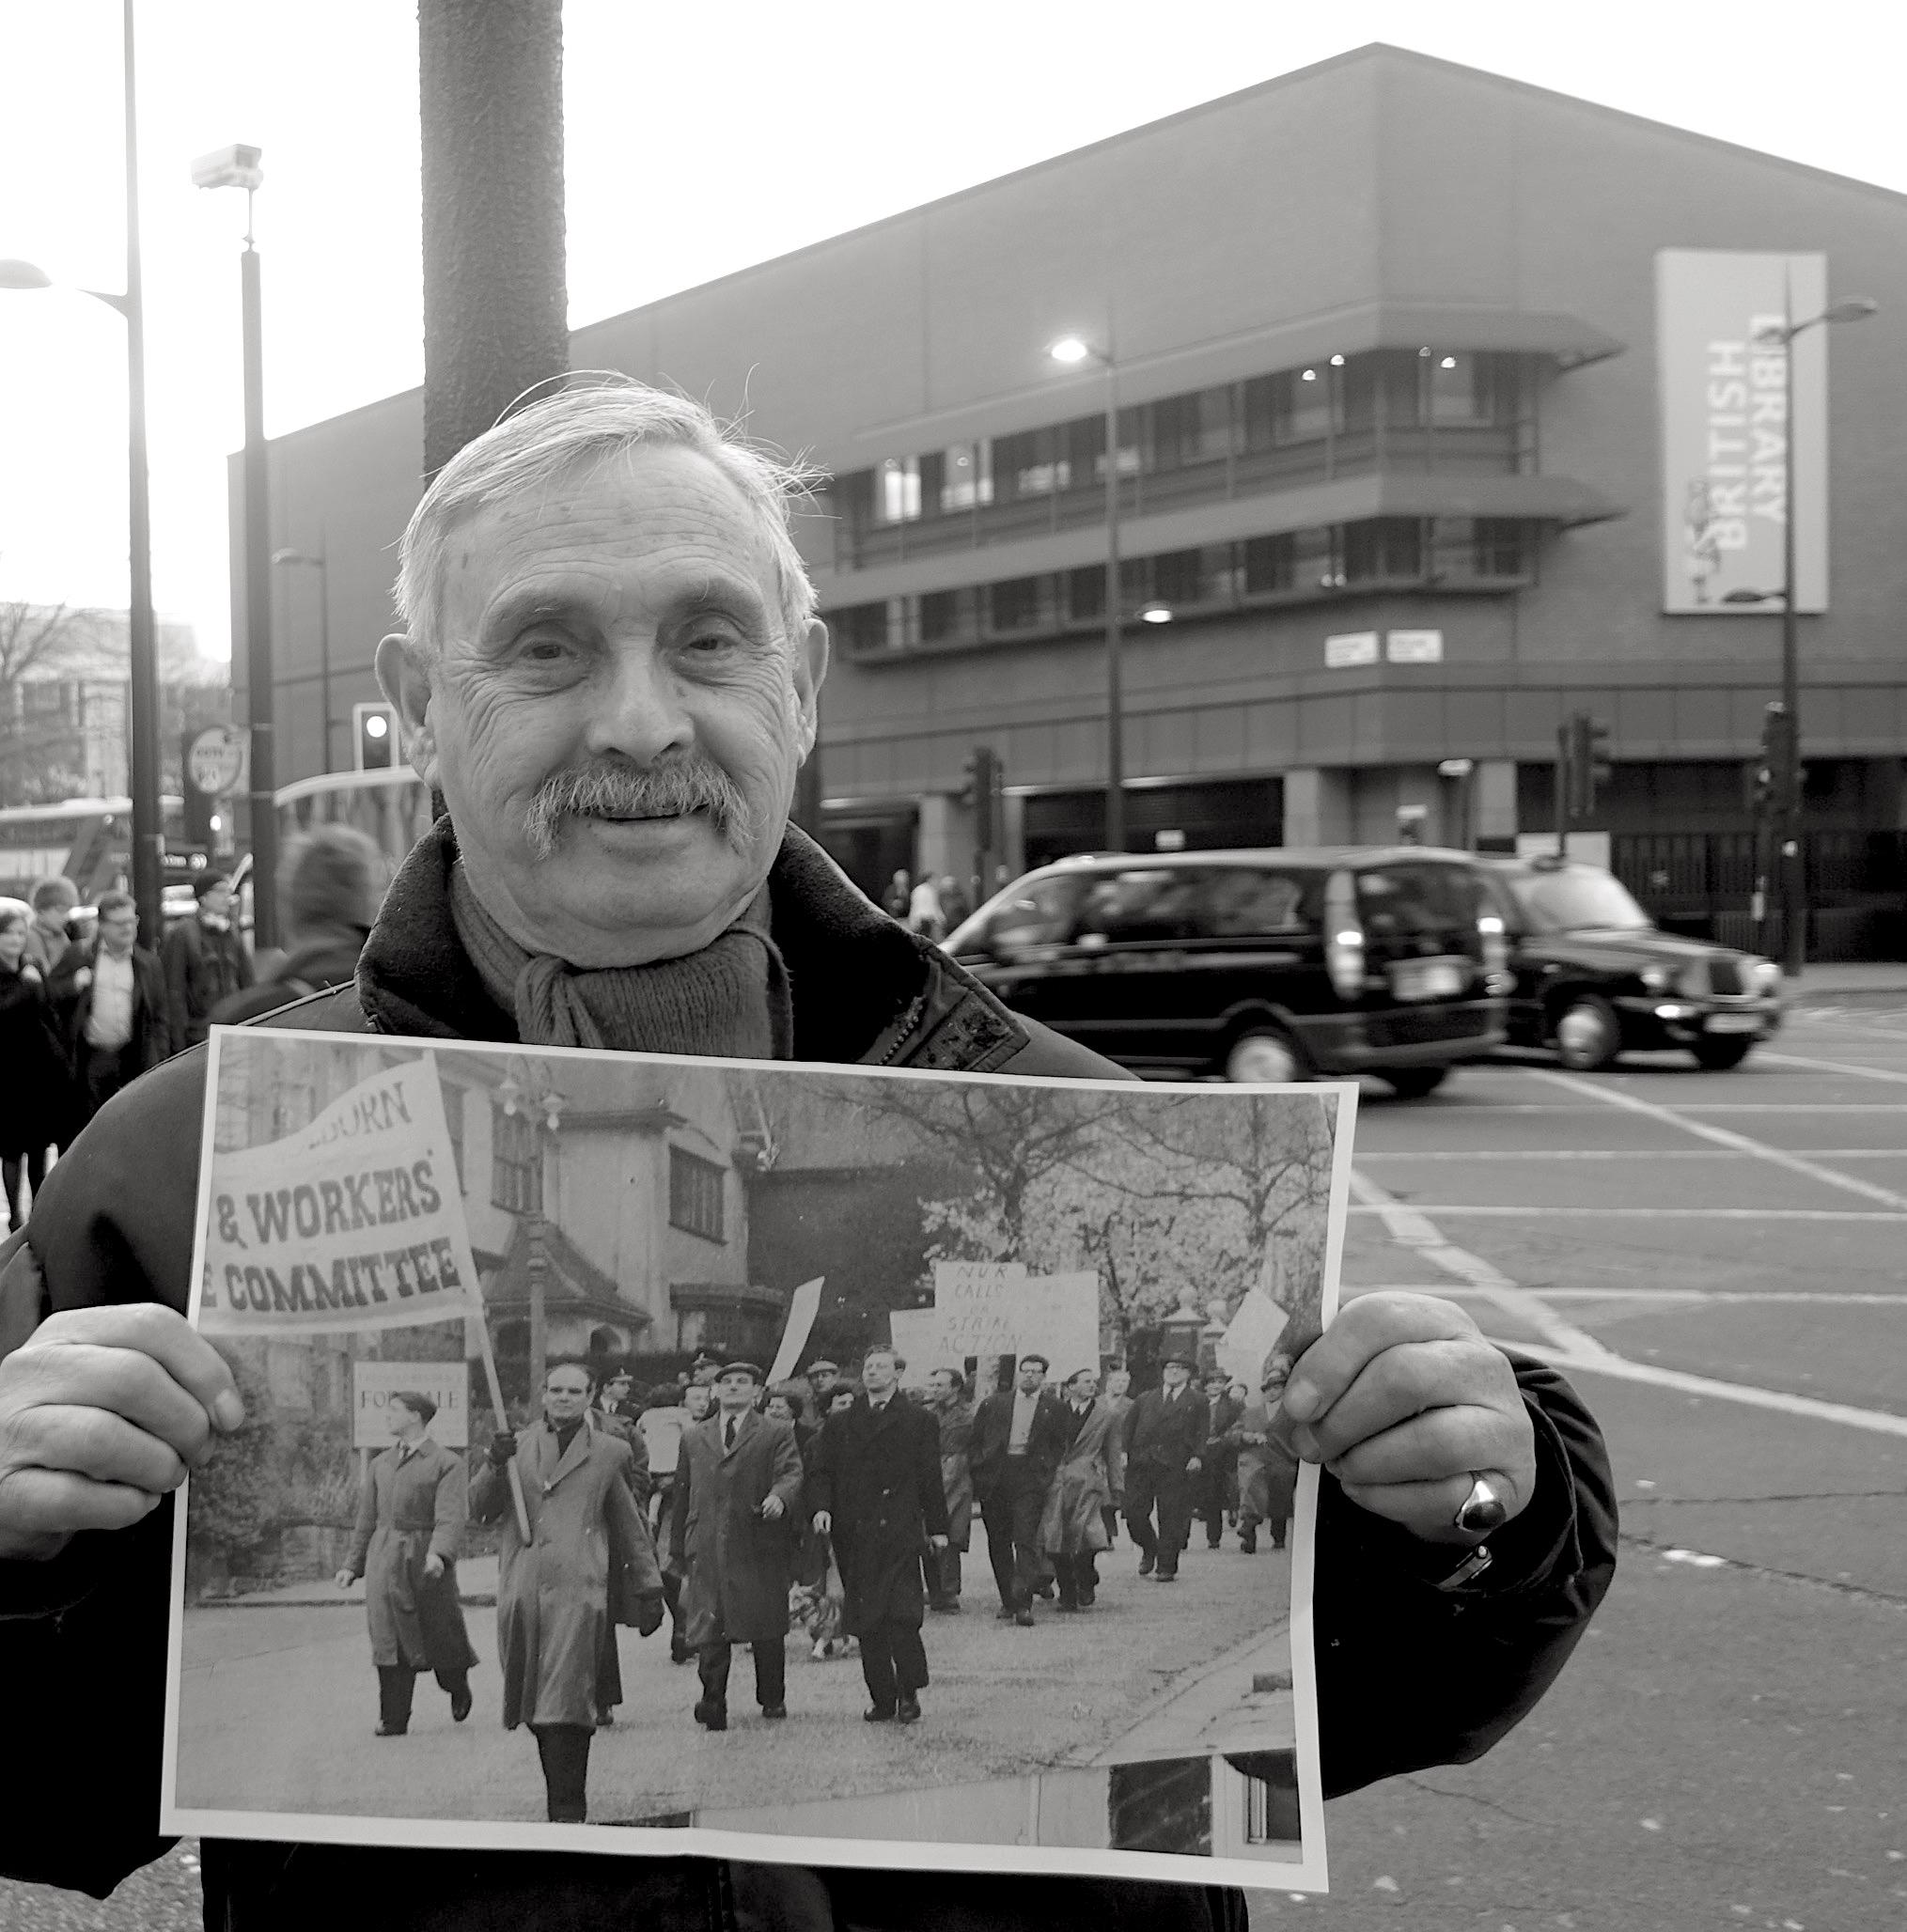 Man holding photo